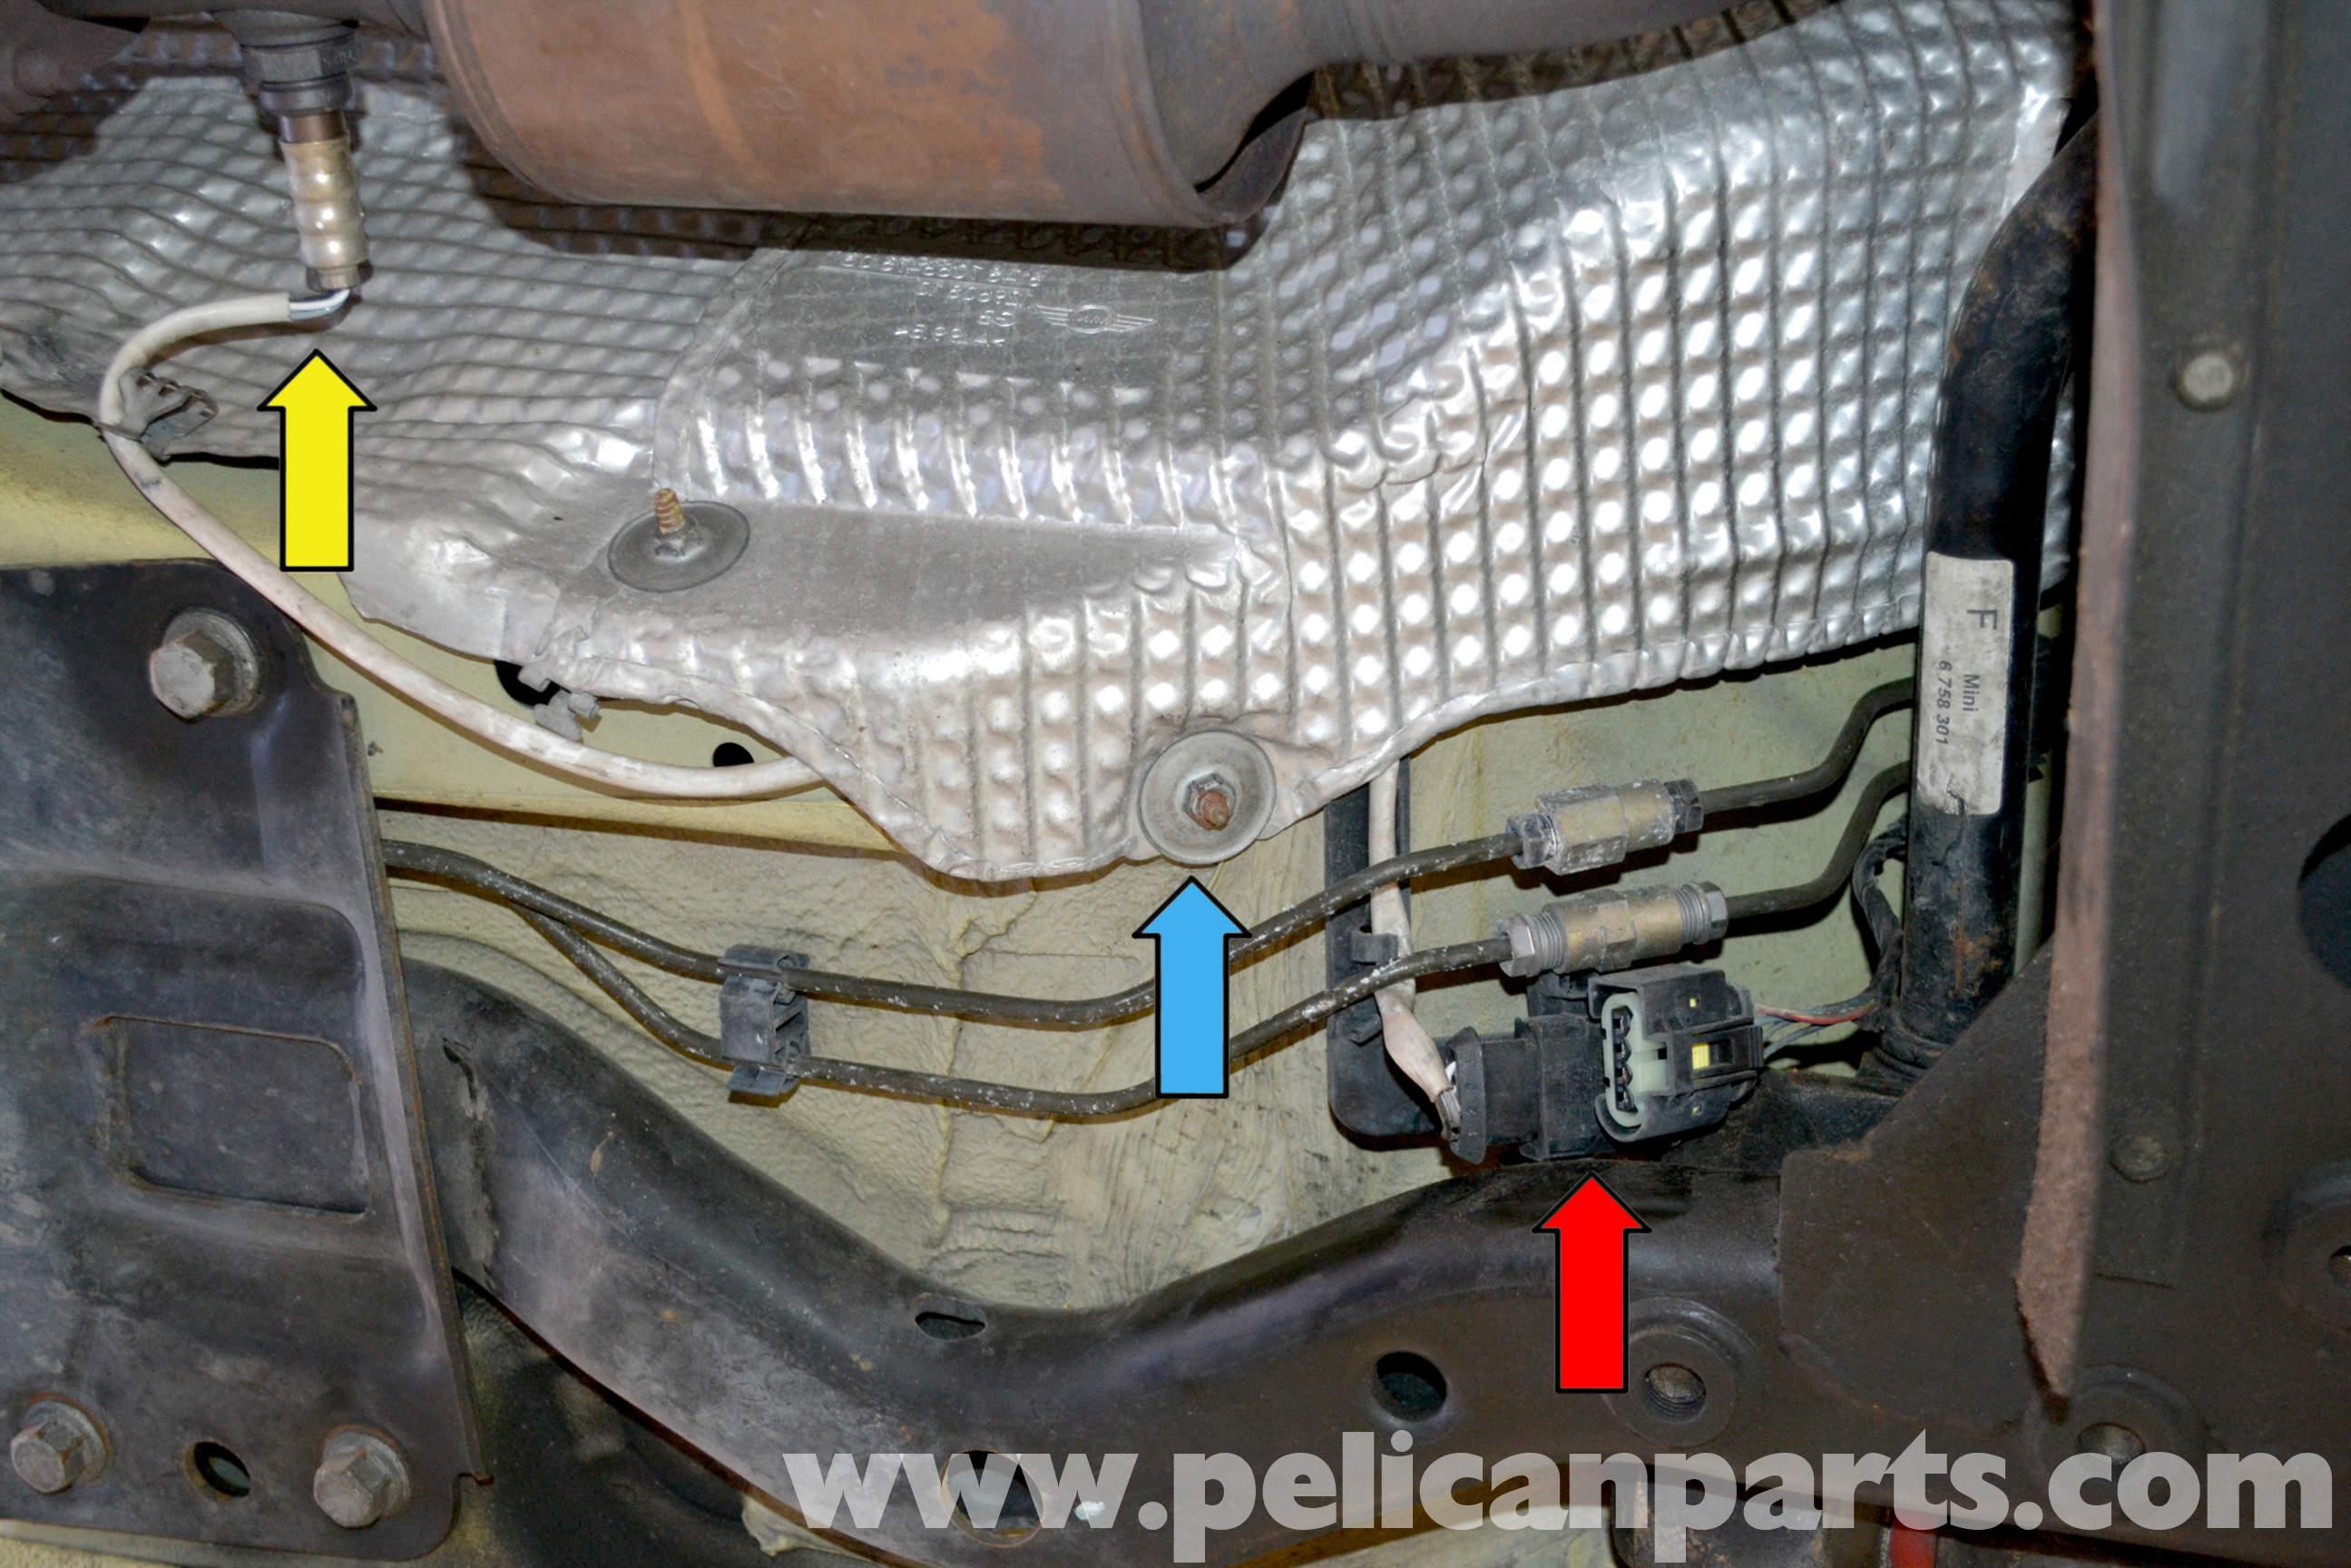 Pelican Technical Article - Mini-R53 - Oxygen Sensor Replacement